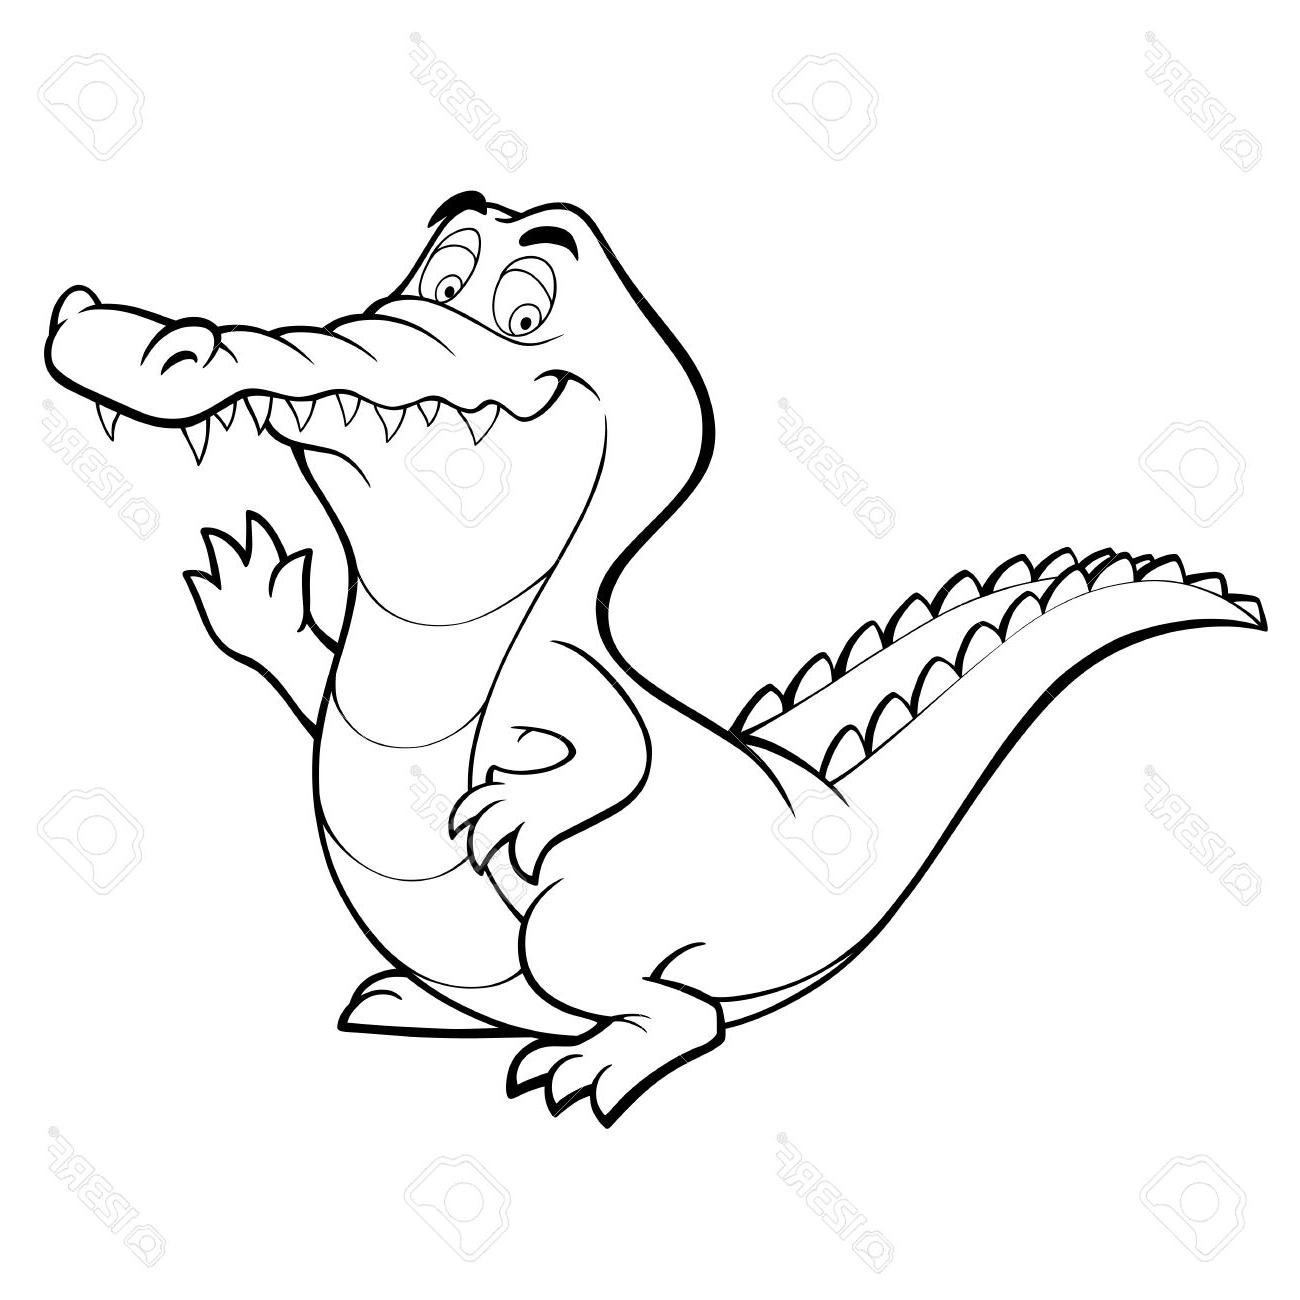 1300x1300 Crocodile Cartoon Drawing